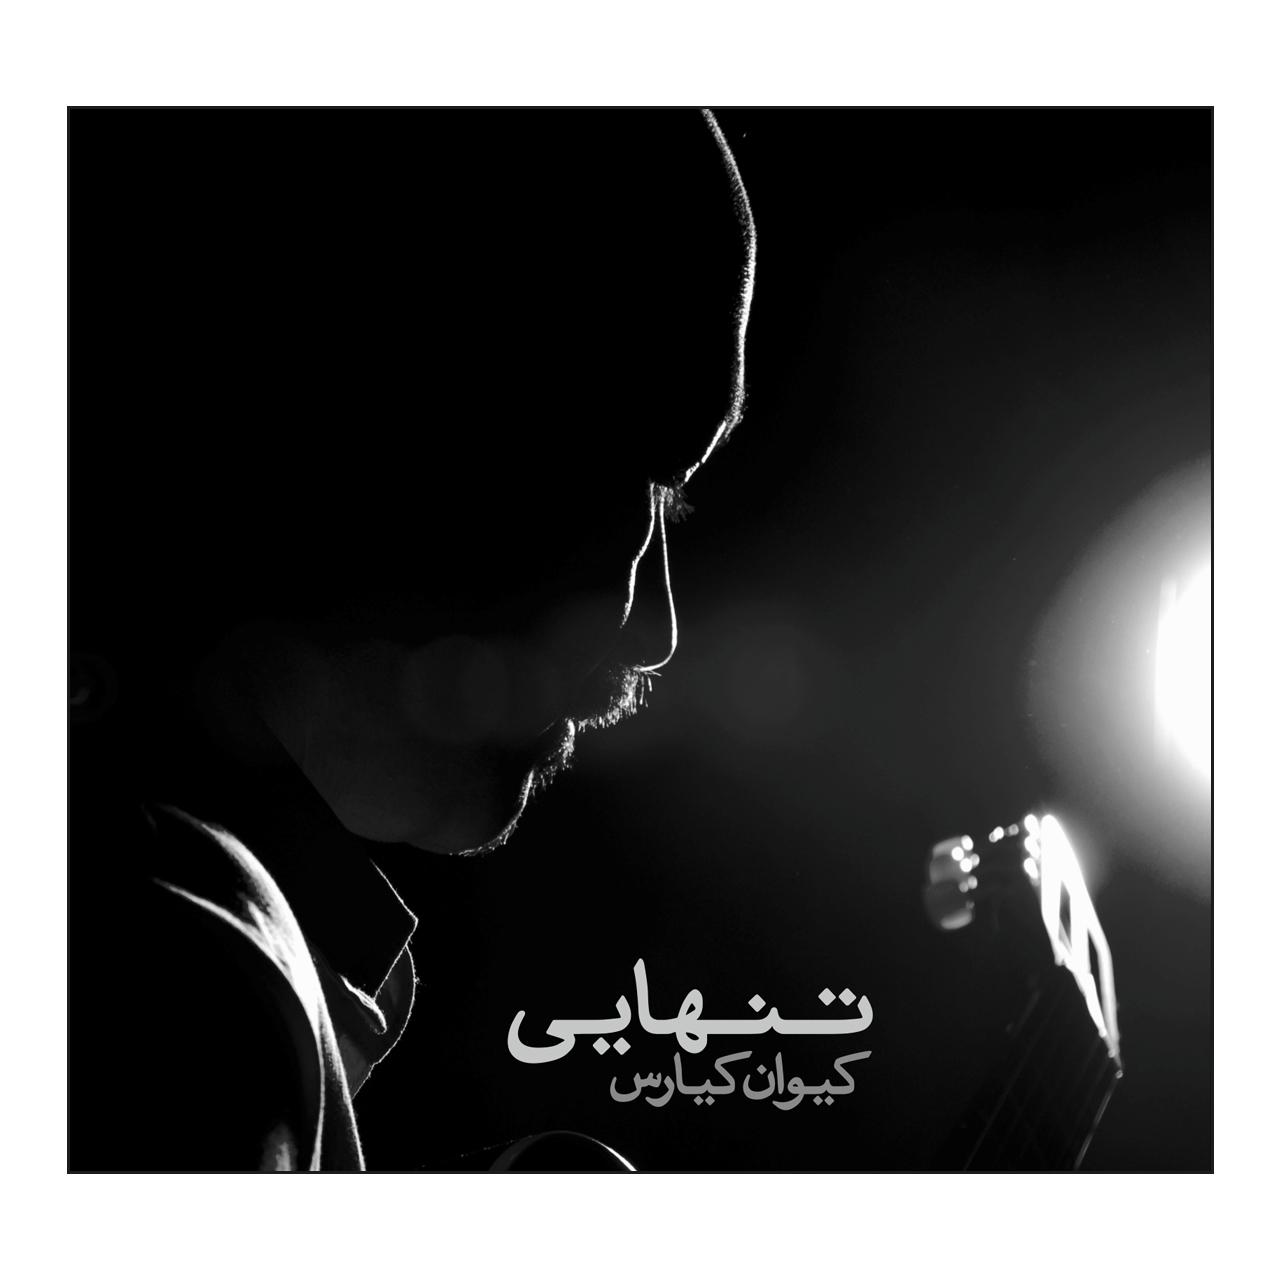 آلبوم موسیقی تنهایی اثر کیوان کیارس